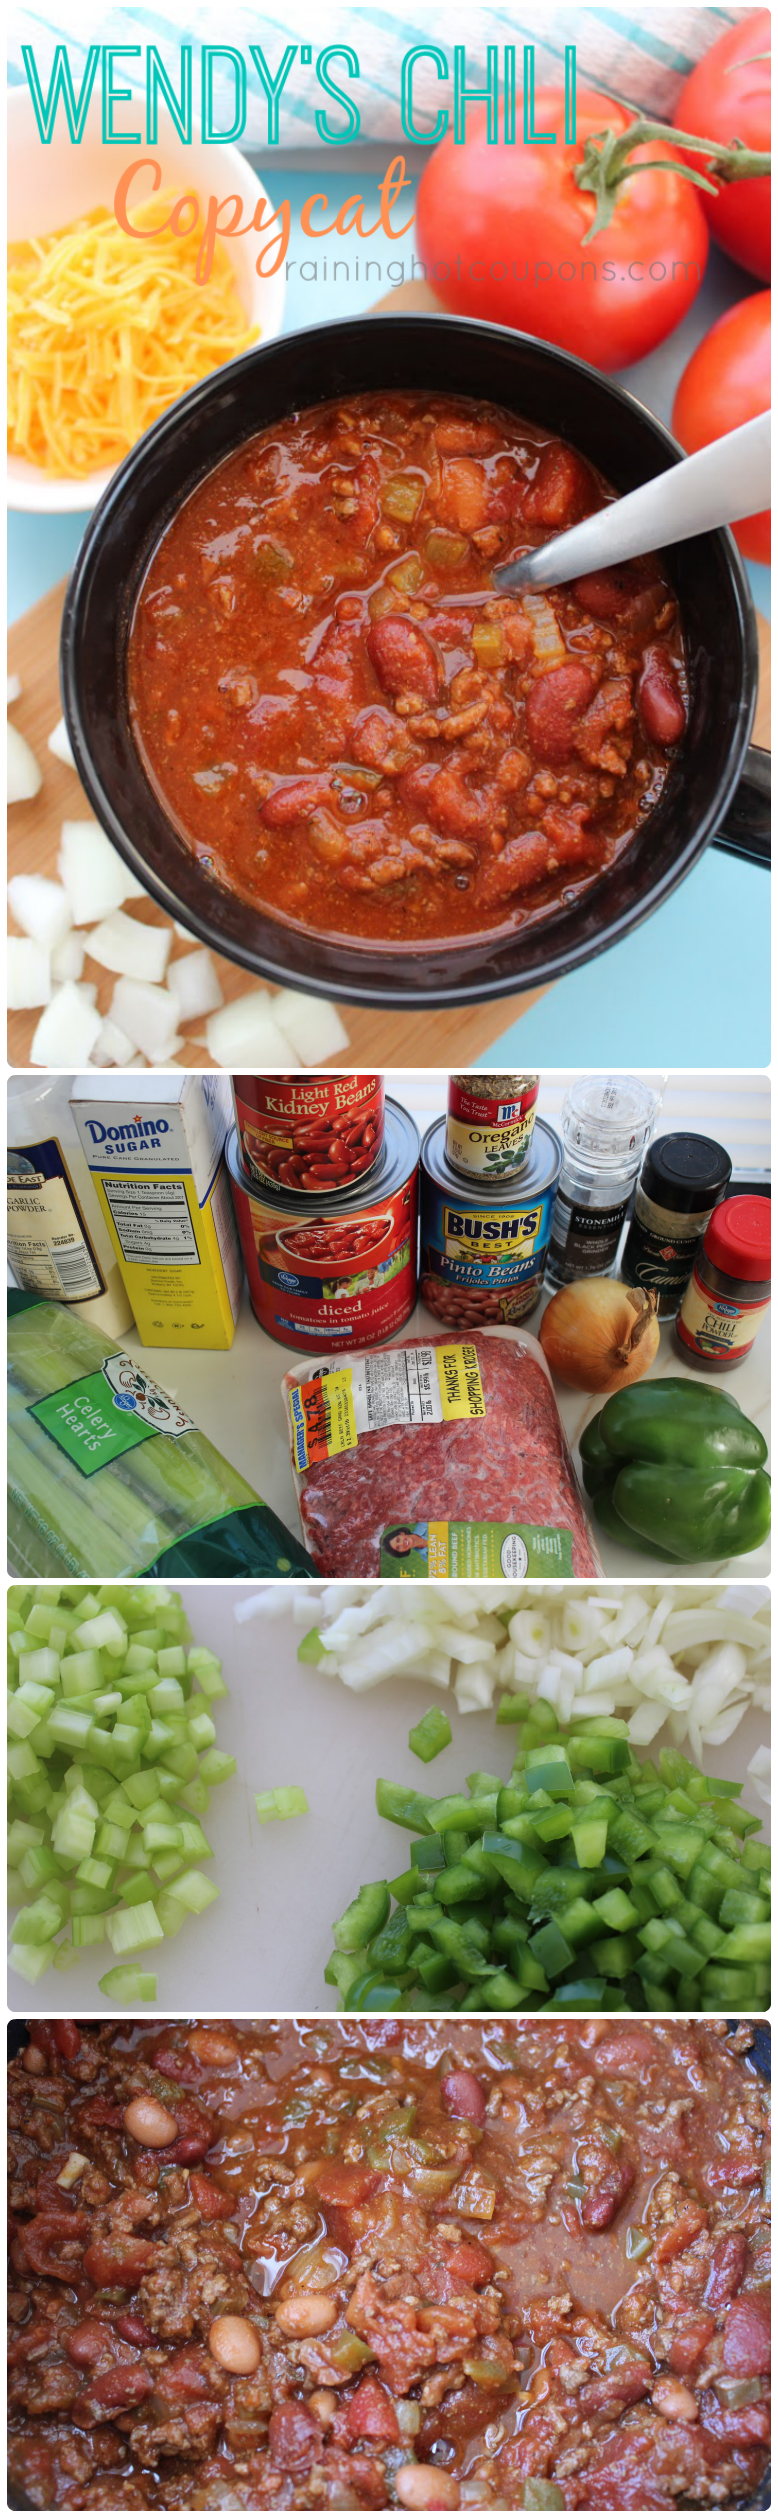 wendy's chili collage, copycat wendy's chili recipe, make Wendy's chili at home